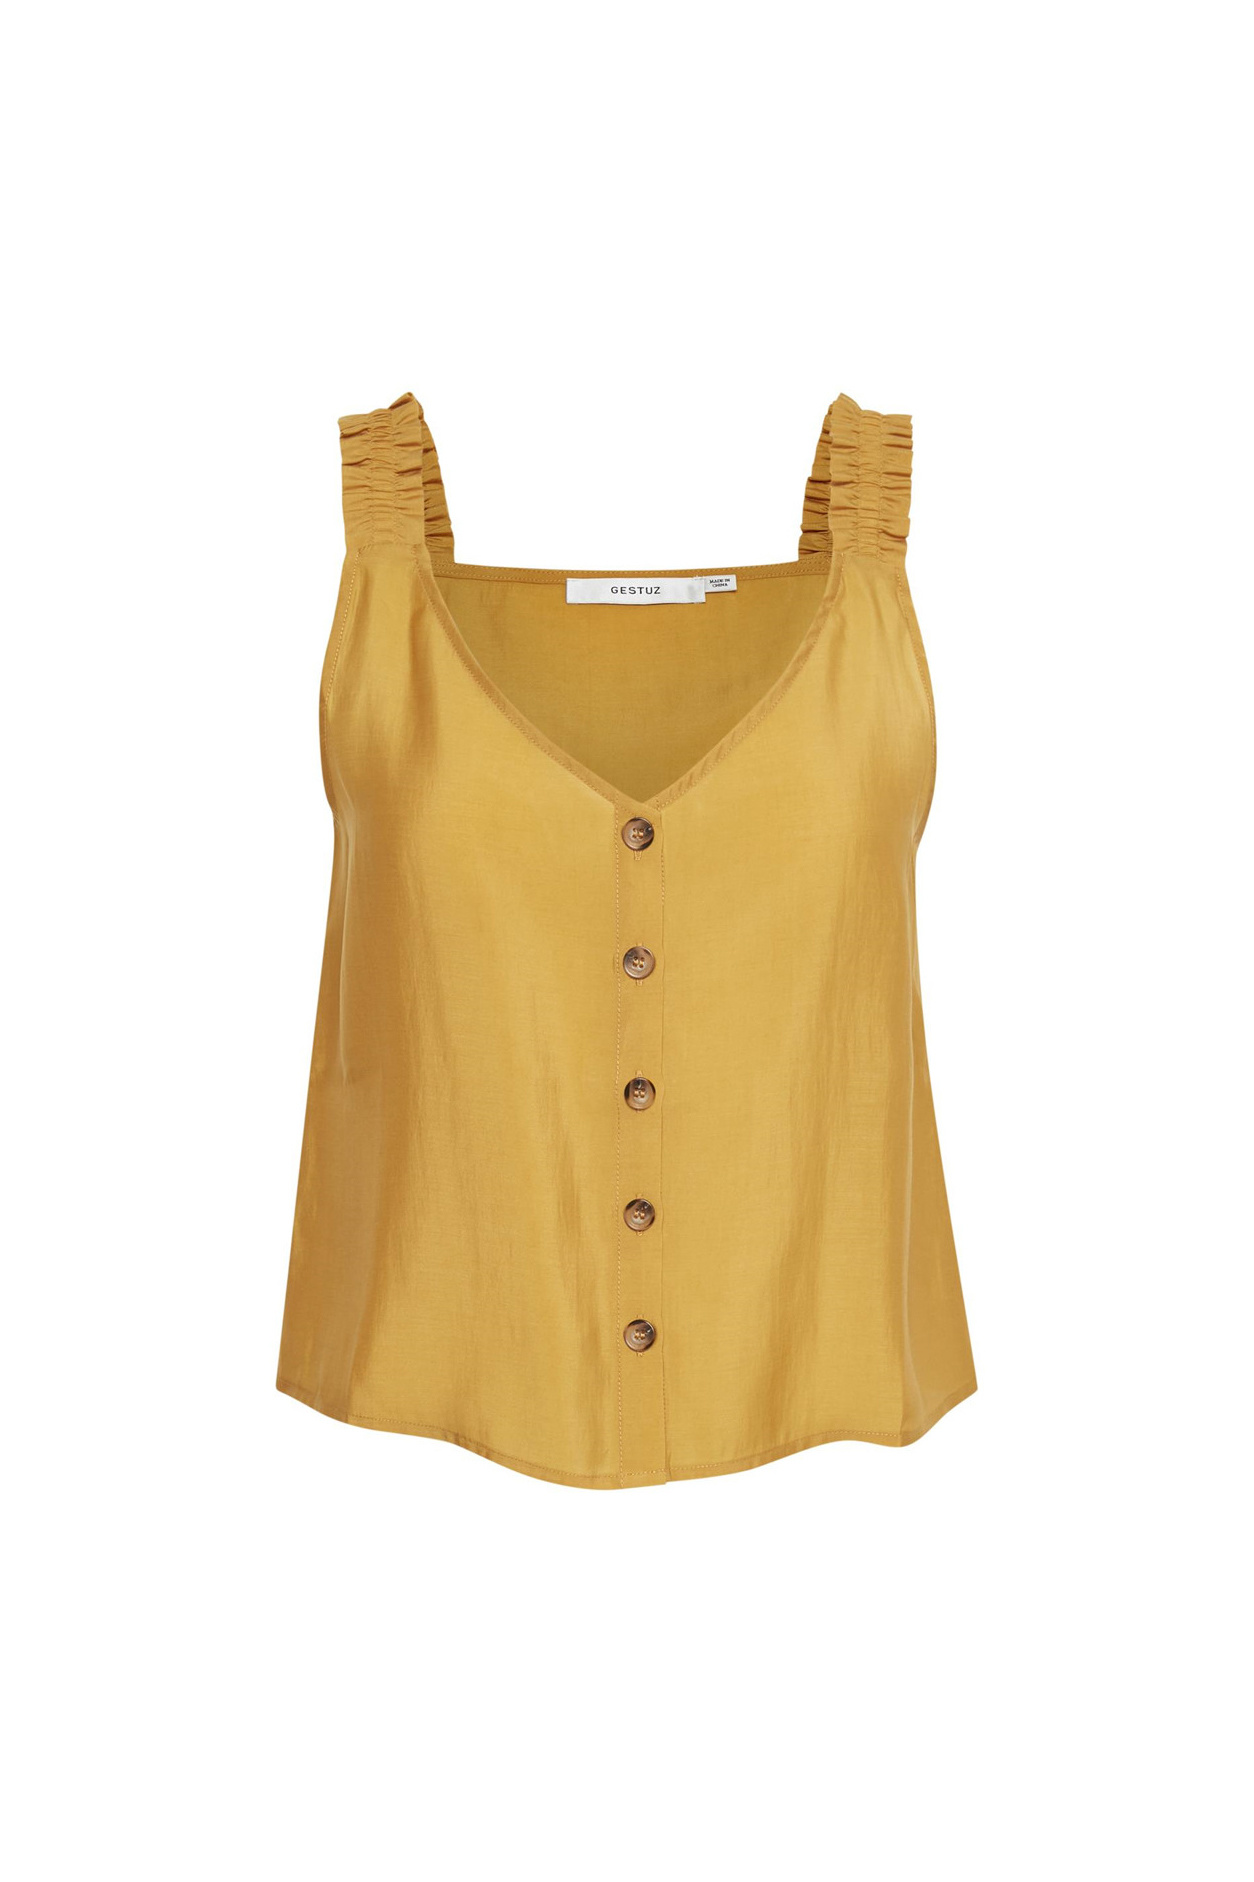 Gestuz Arienne Top - Yellow